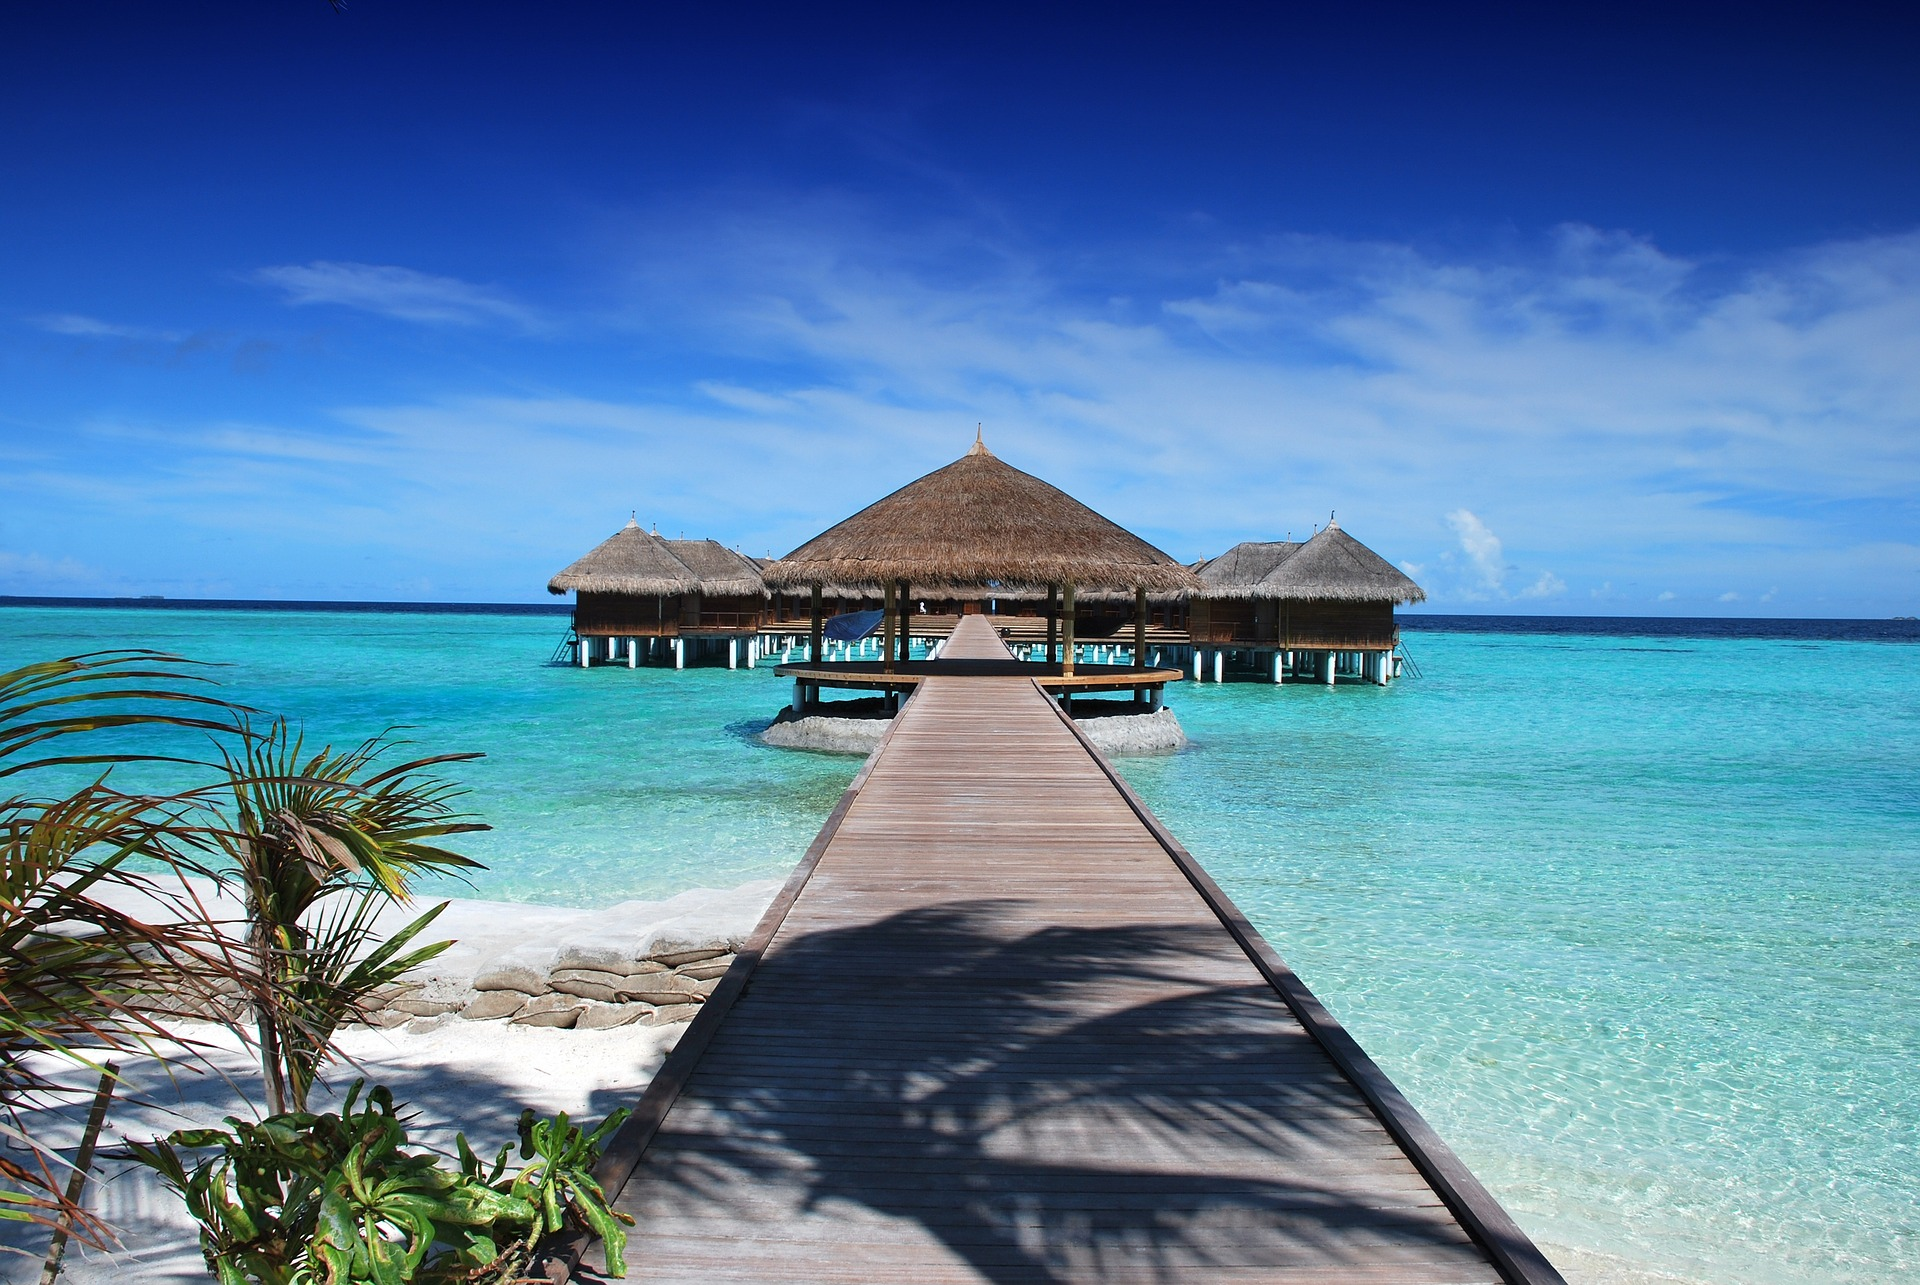 maldives-666122_1920.jpg